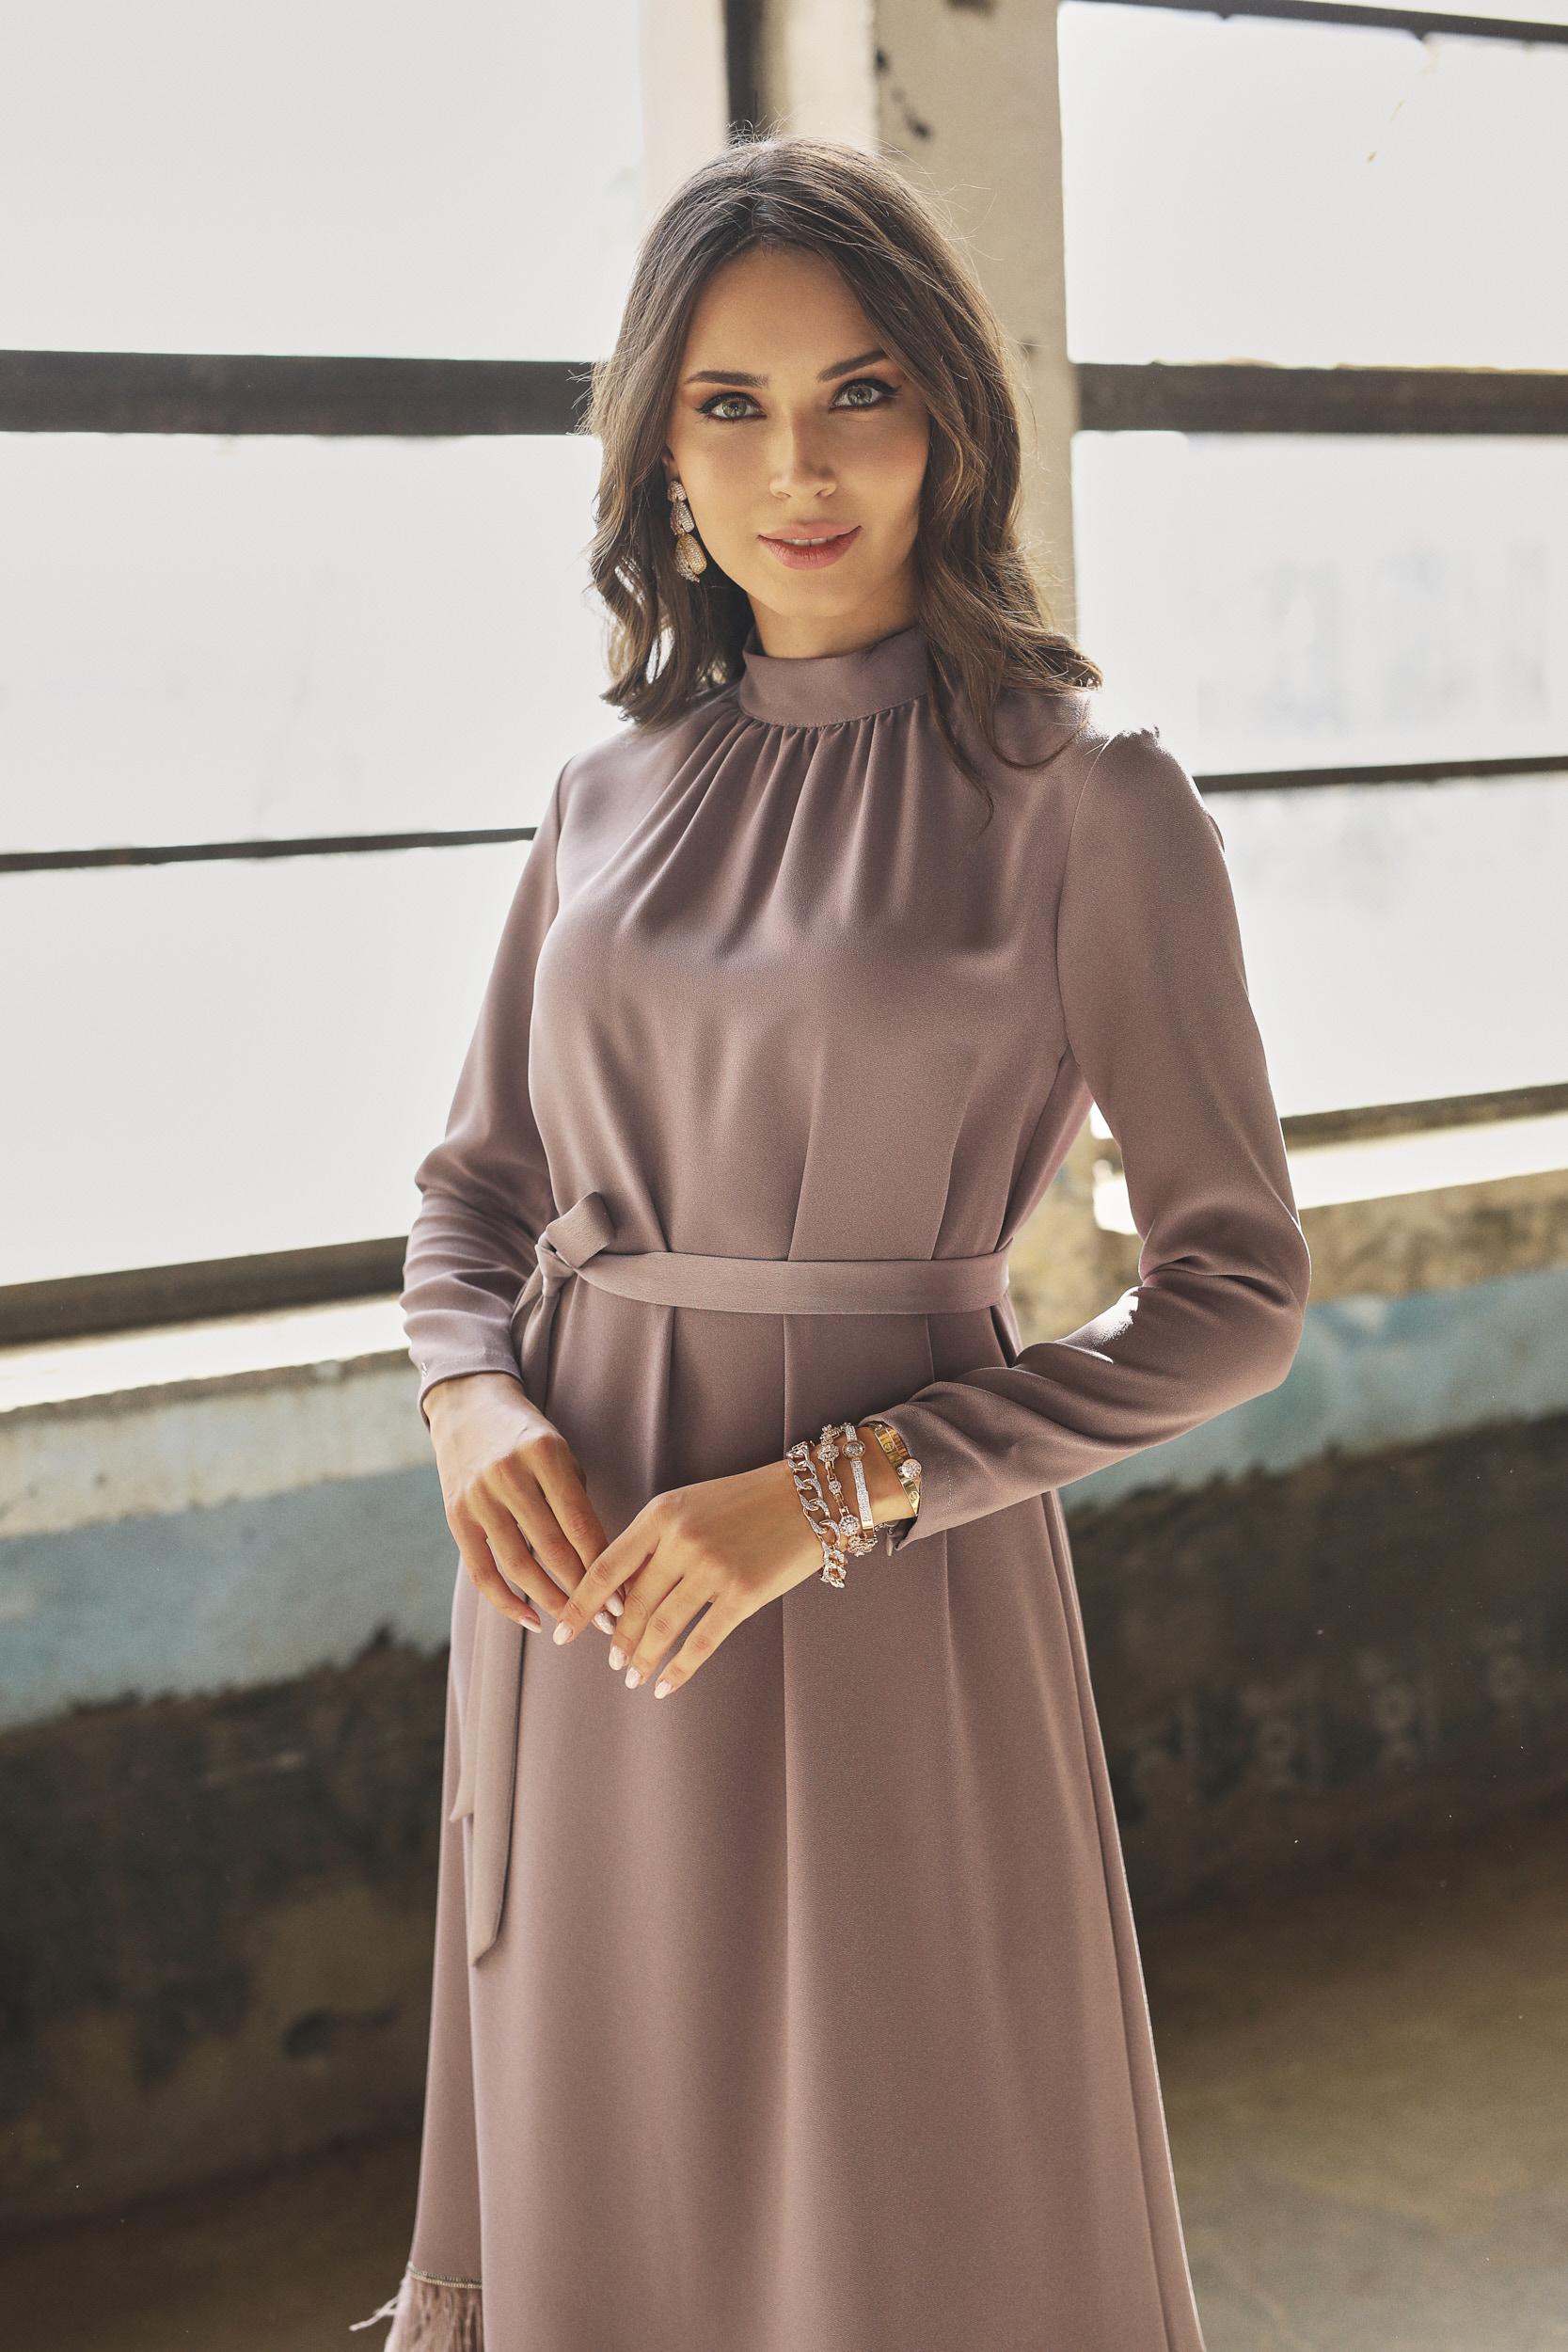 Hercaı Elbise Koyu Lilyum 3240w21